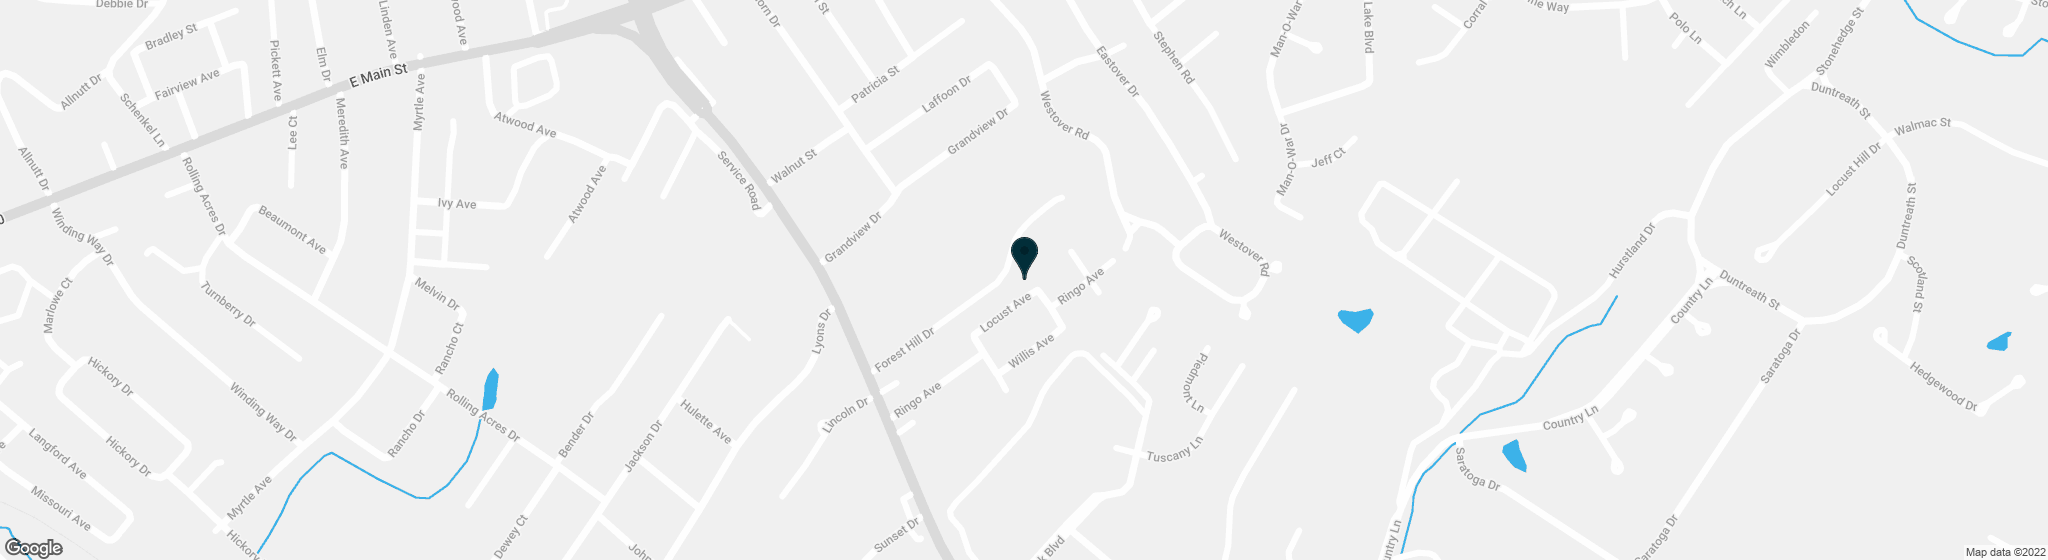 146 Locust Avenue Frankfort KY 40601